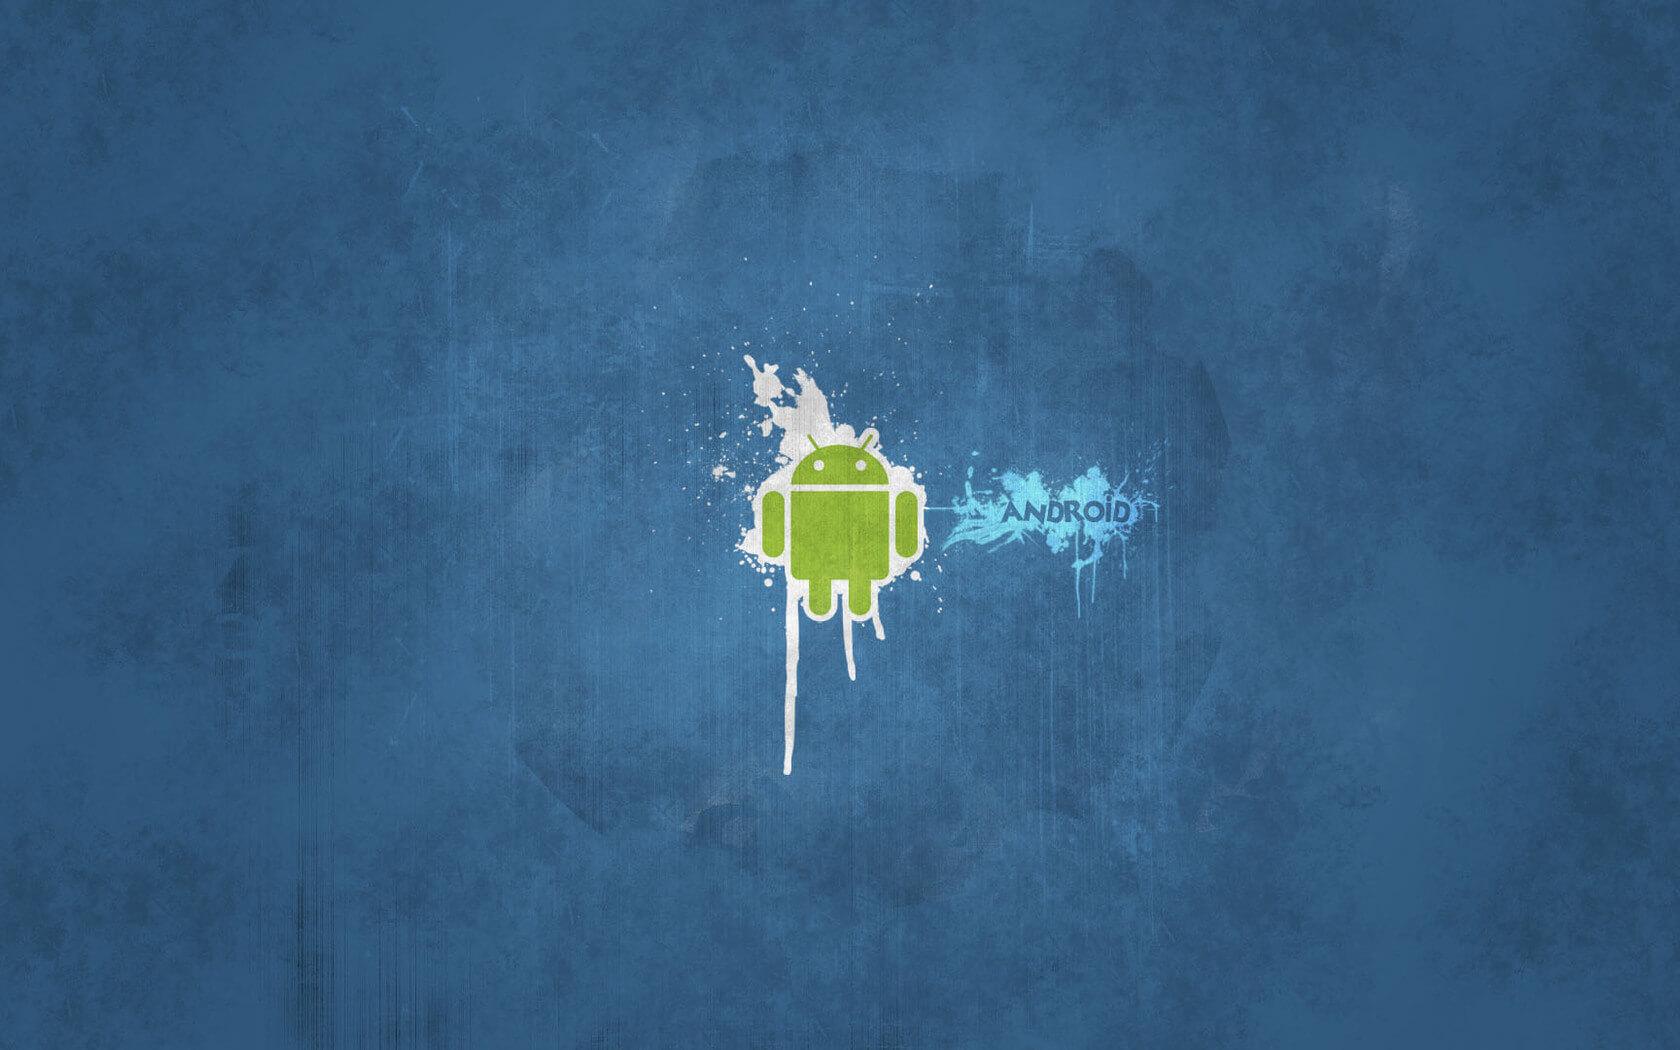 картинки для обоев на андроид